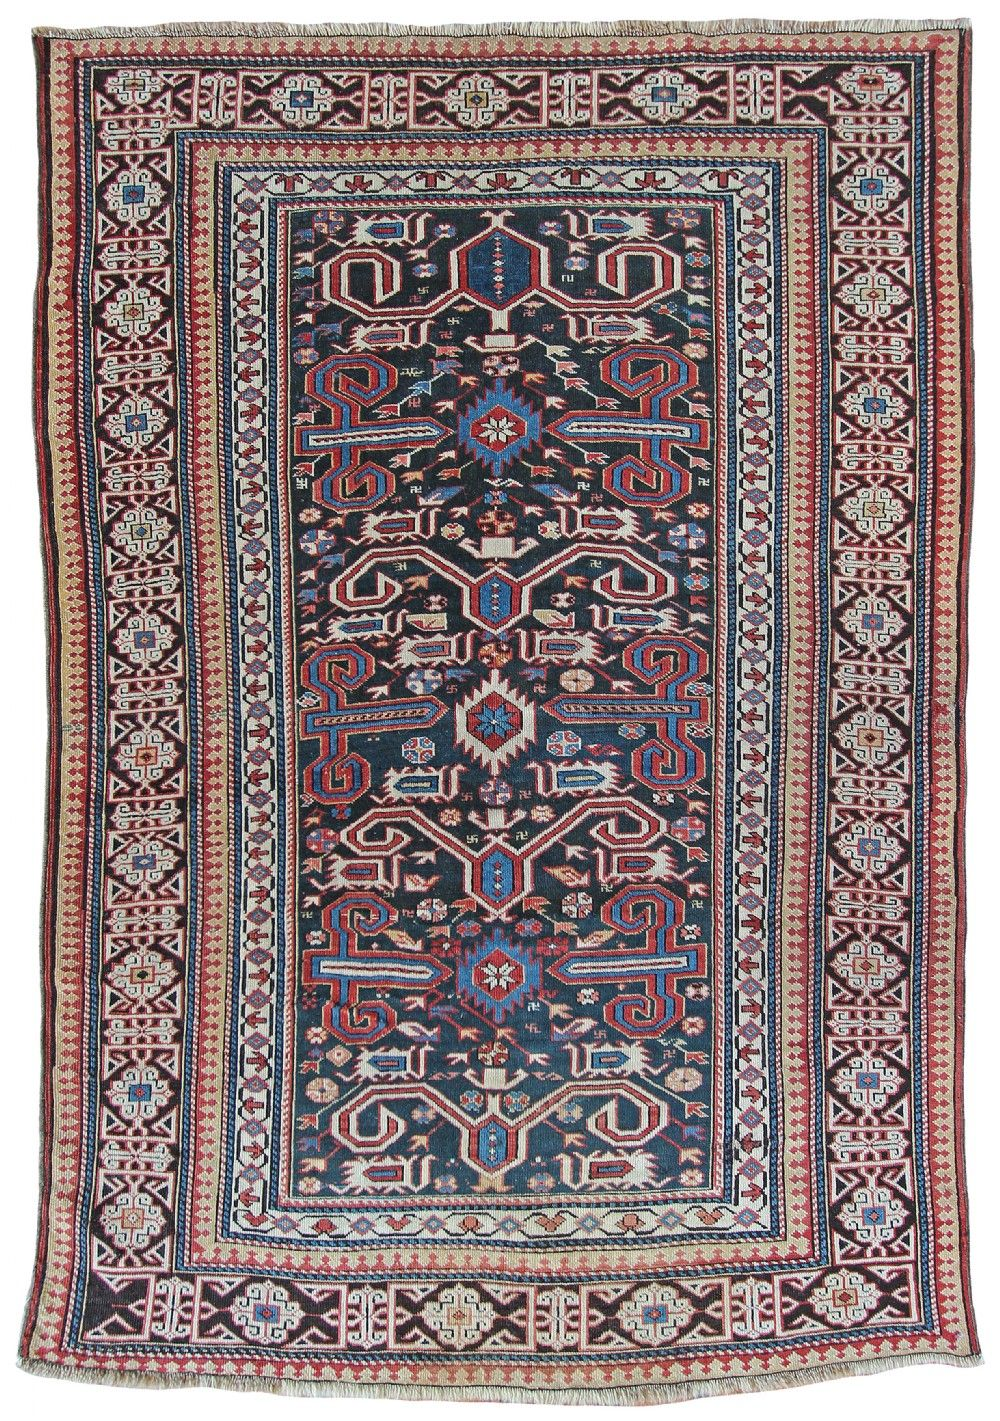 ANTIQUE PEREPEDIL RUG CAUCASUS | Rugs, Rugs on carpet ... Persian Pomegranate Trees For Sale